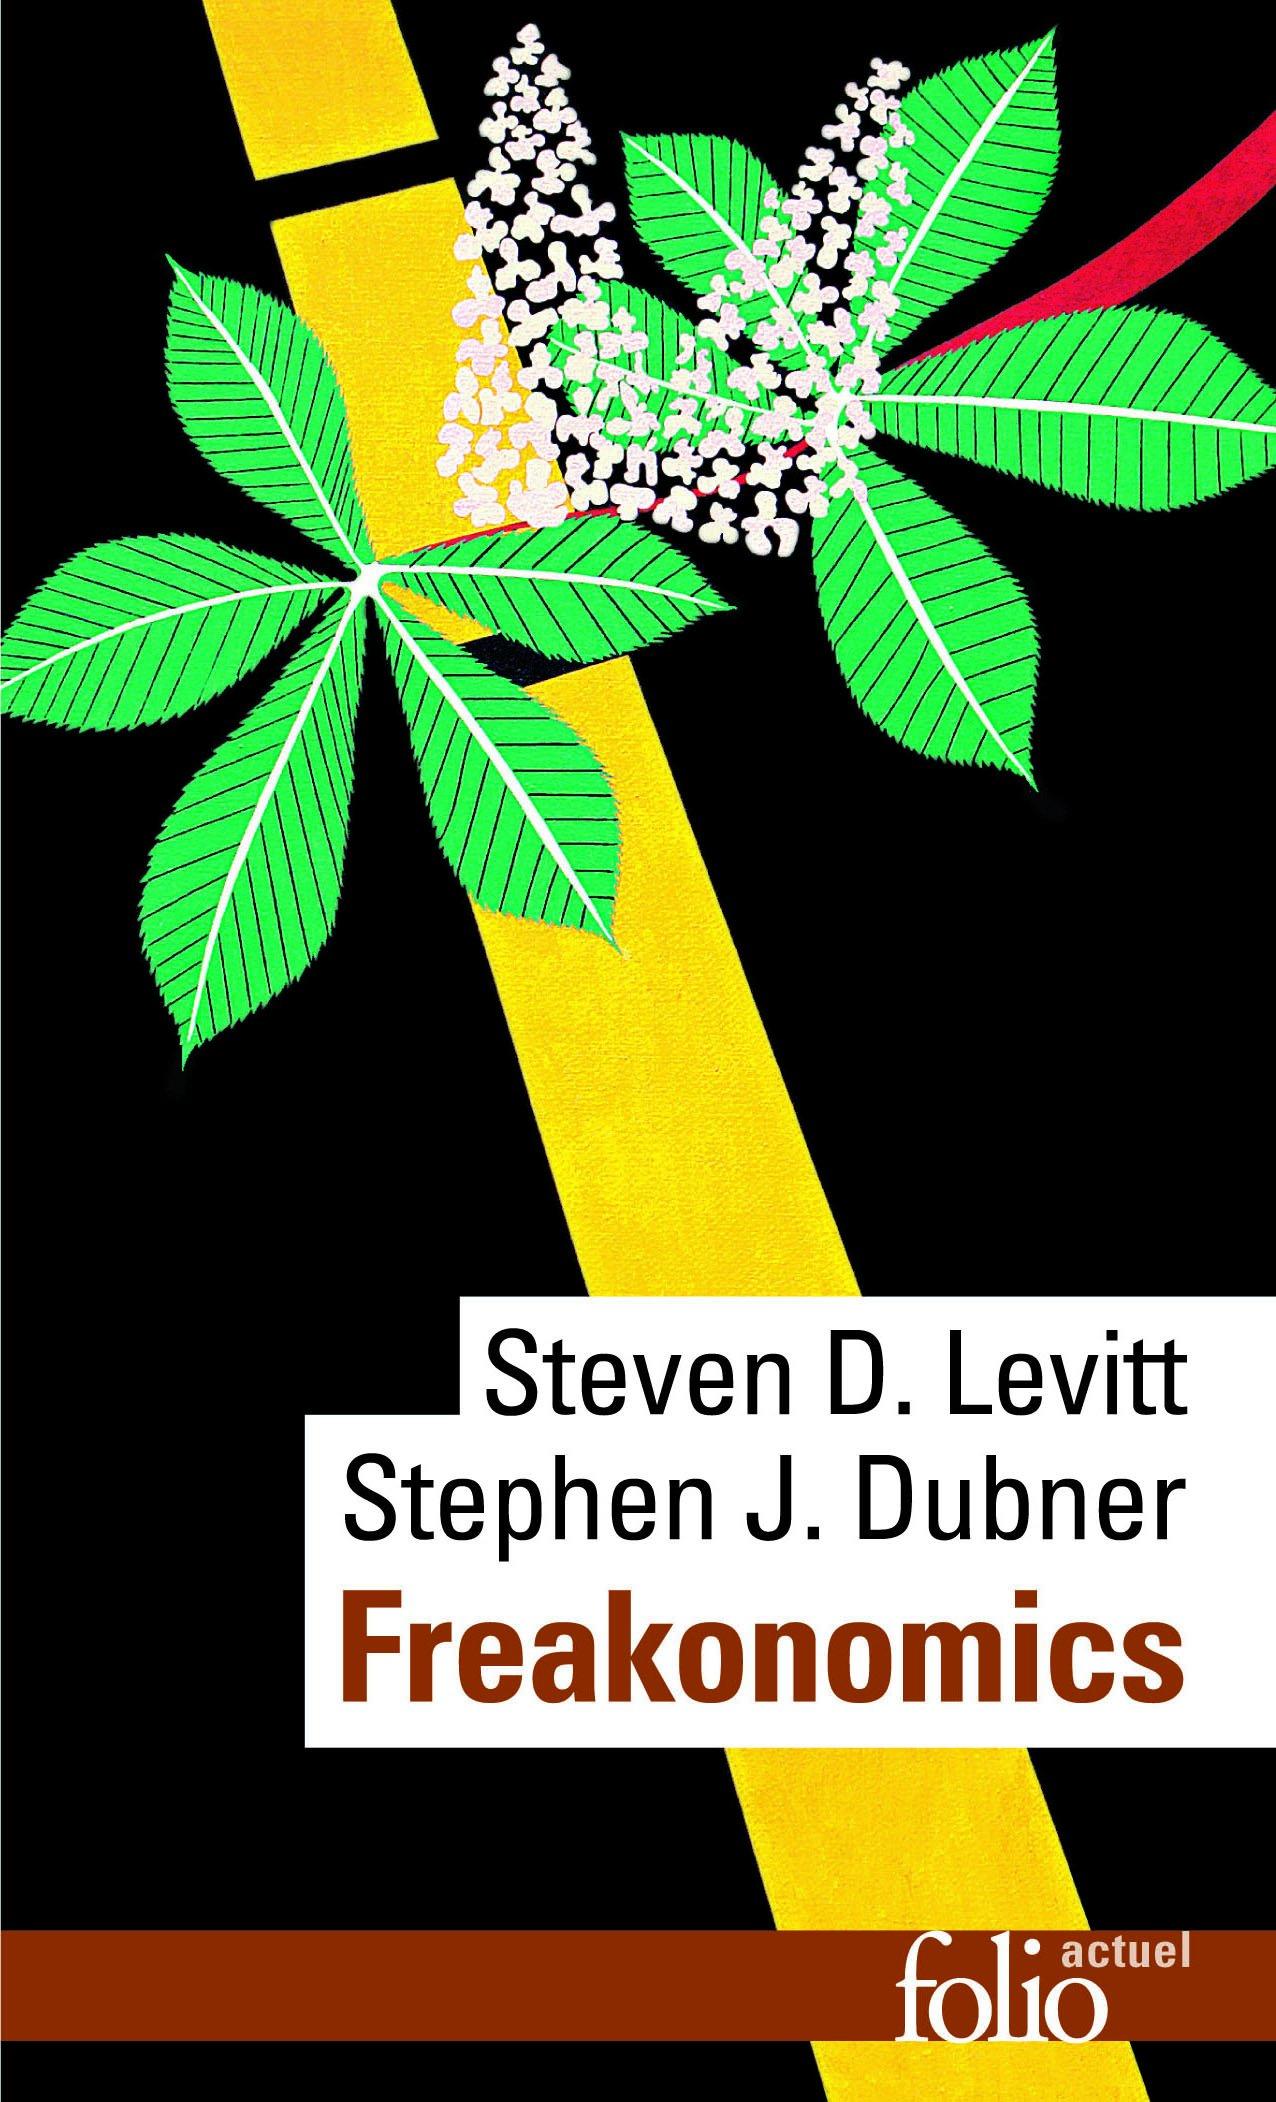 Couverture livre Freakonomics, Levitt & Dubner